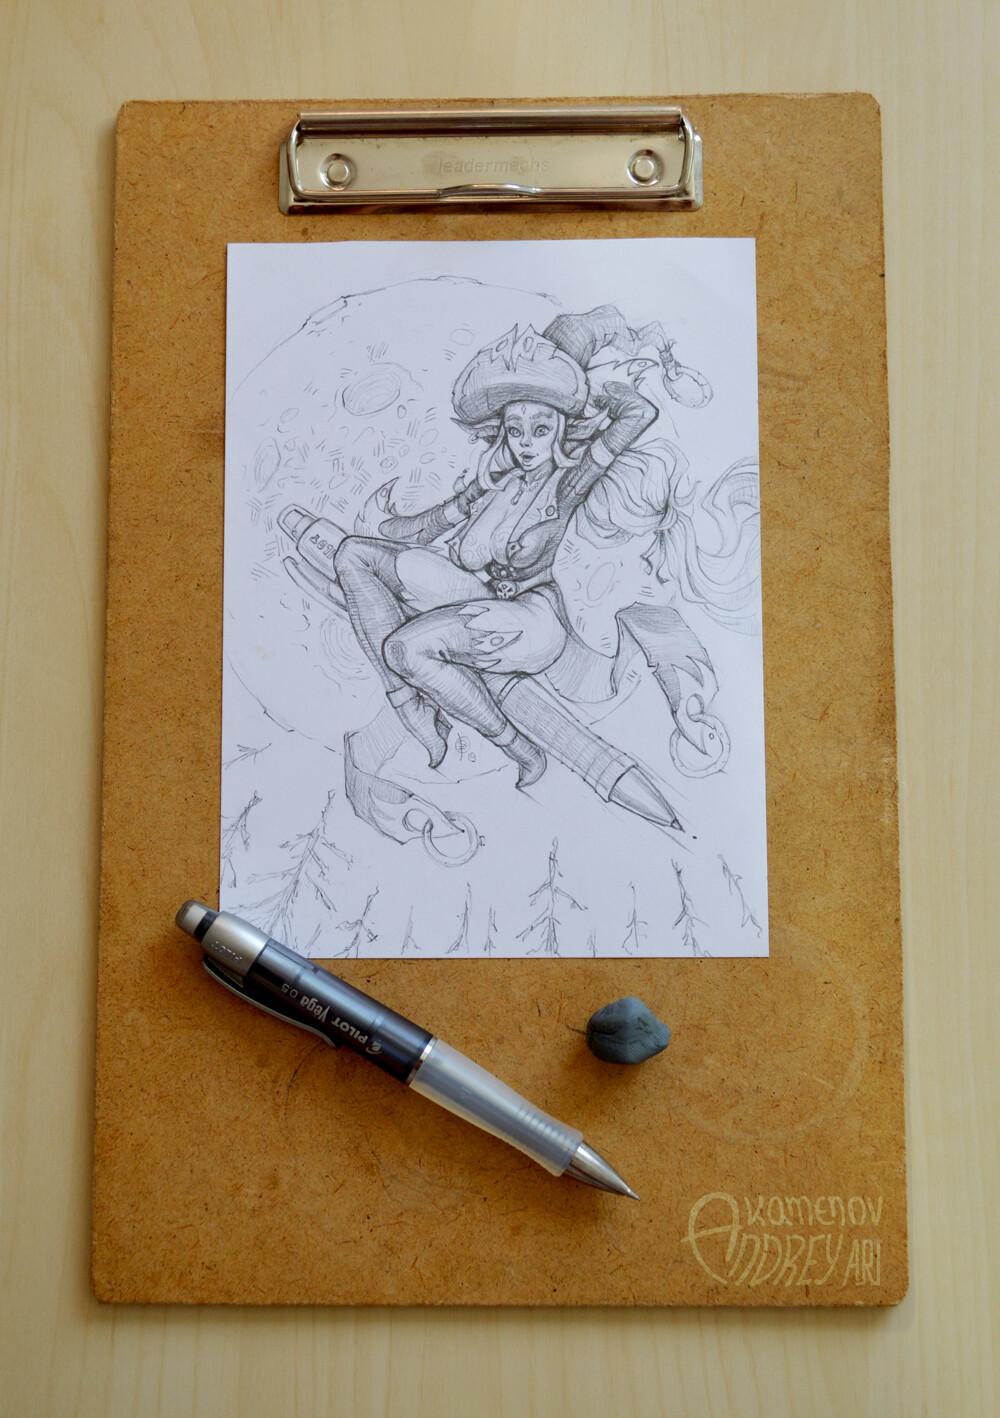 Andrey kamenov witch newpencil 15x20 photo